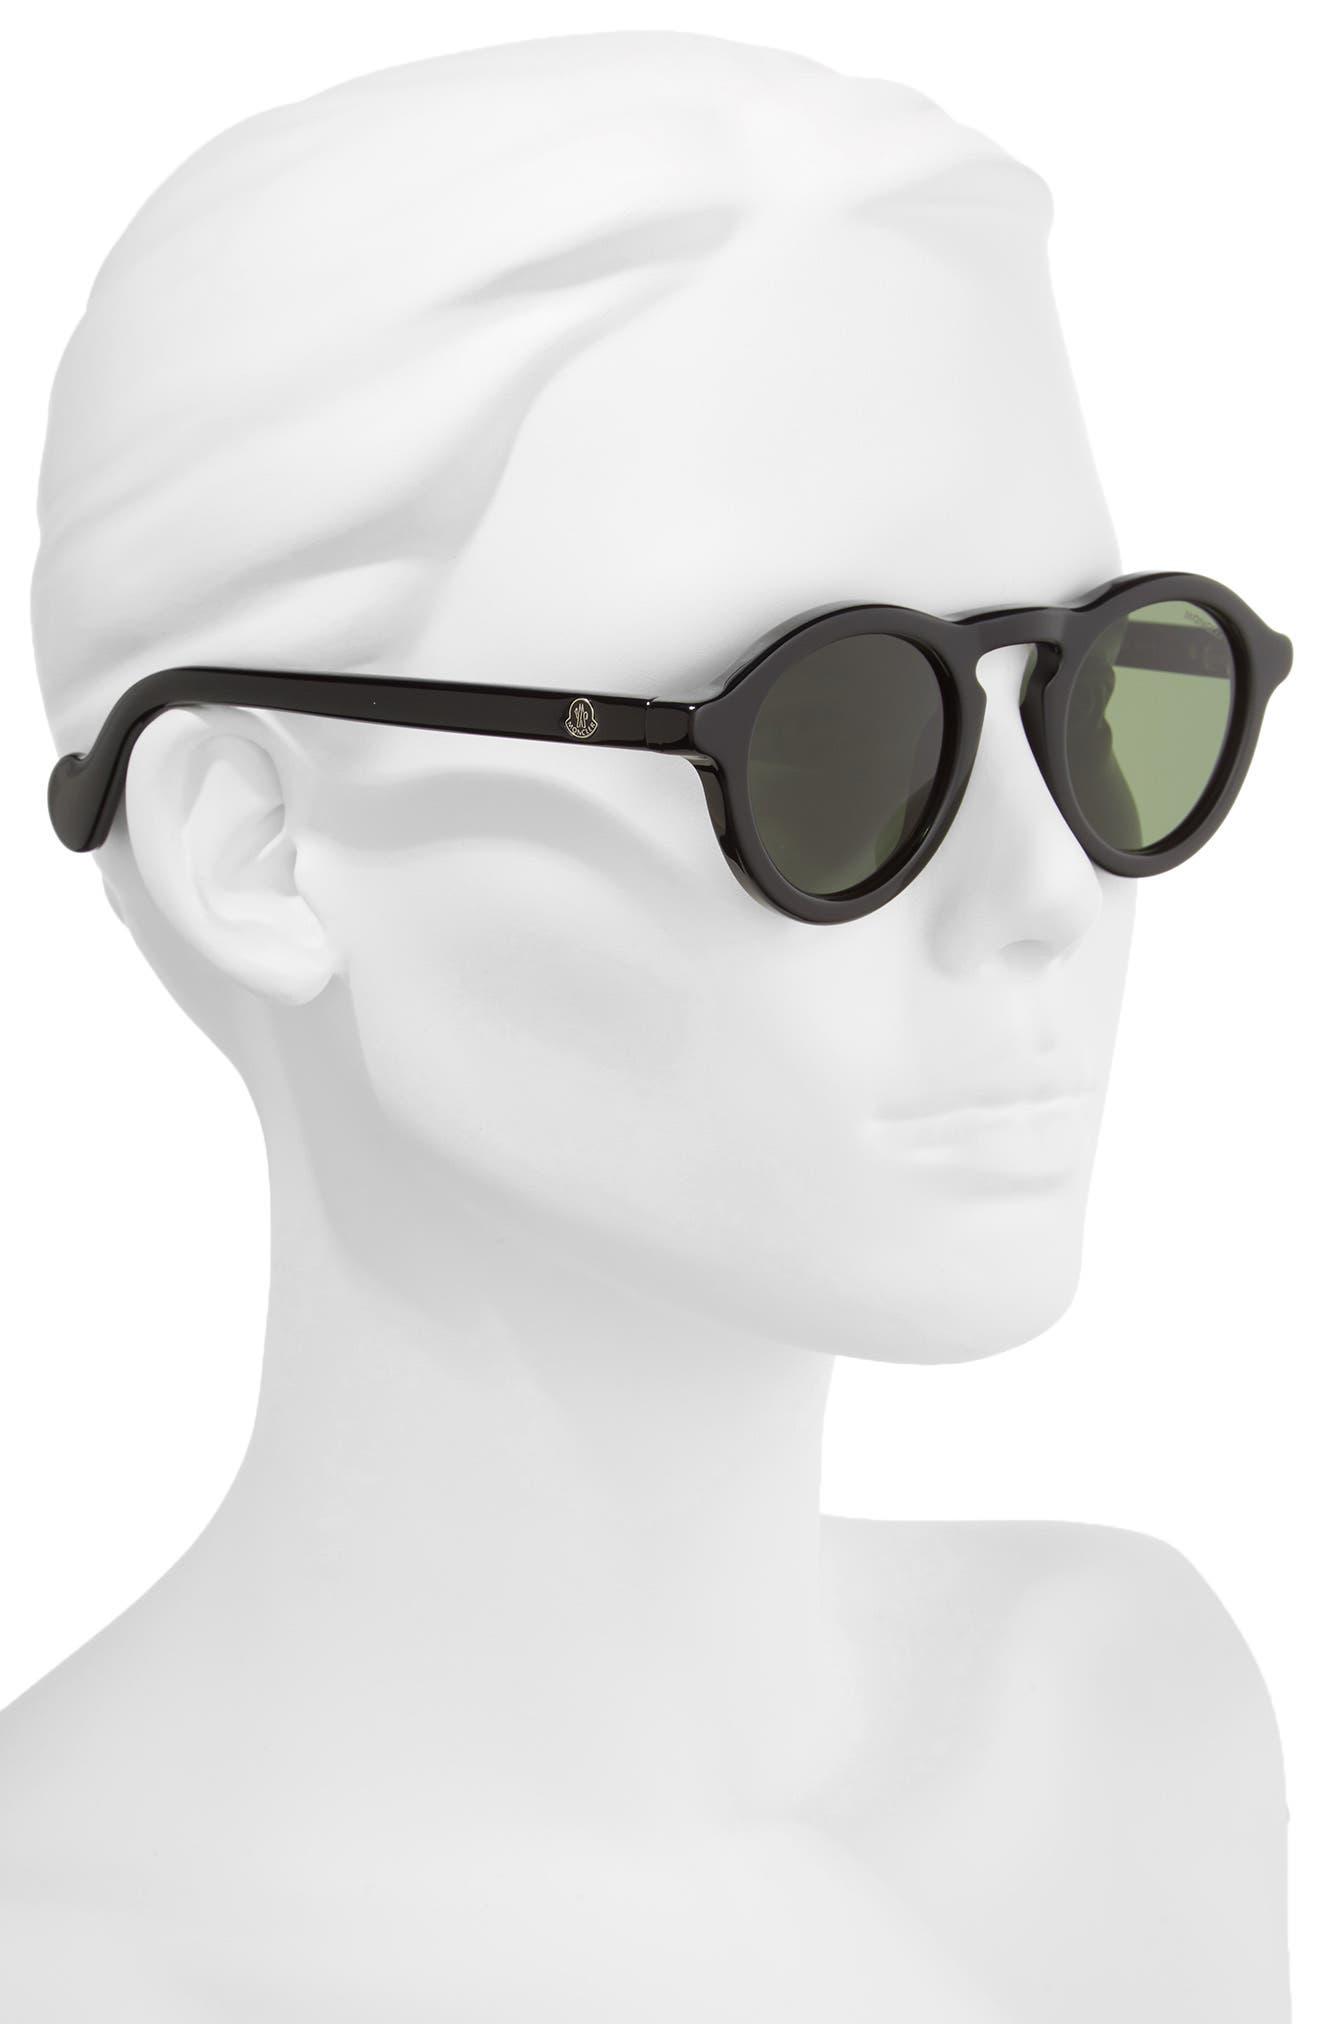 46mm Round Sunglasses,                             Alternate thumbnail 2, color,                             BLACK/ VINTAGE GREEN